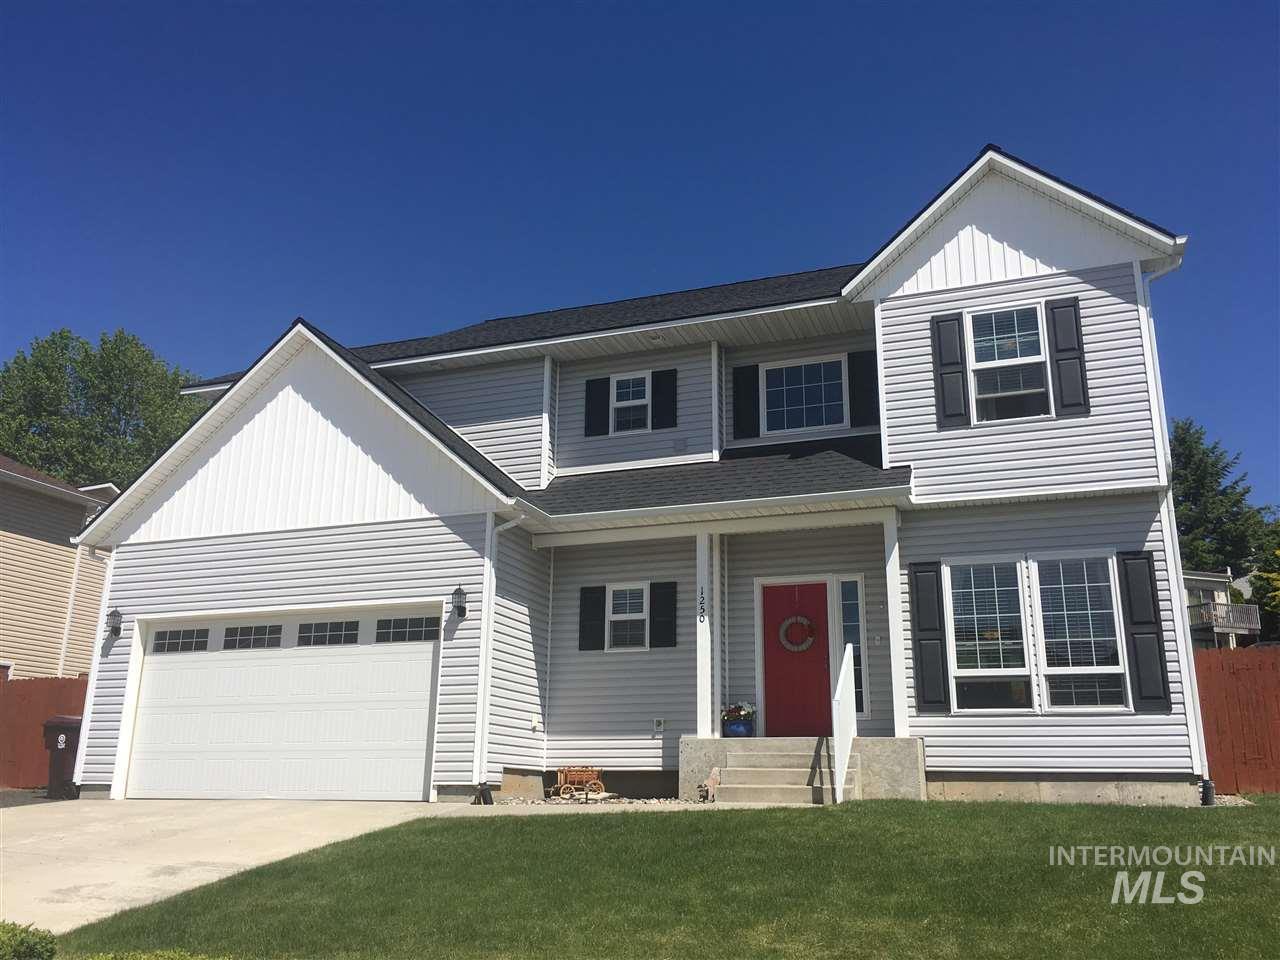 Single Family Home for Sale at 1250 SW Hannah Pullman, Washington 99163